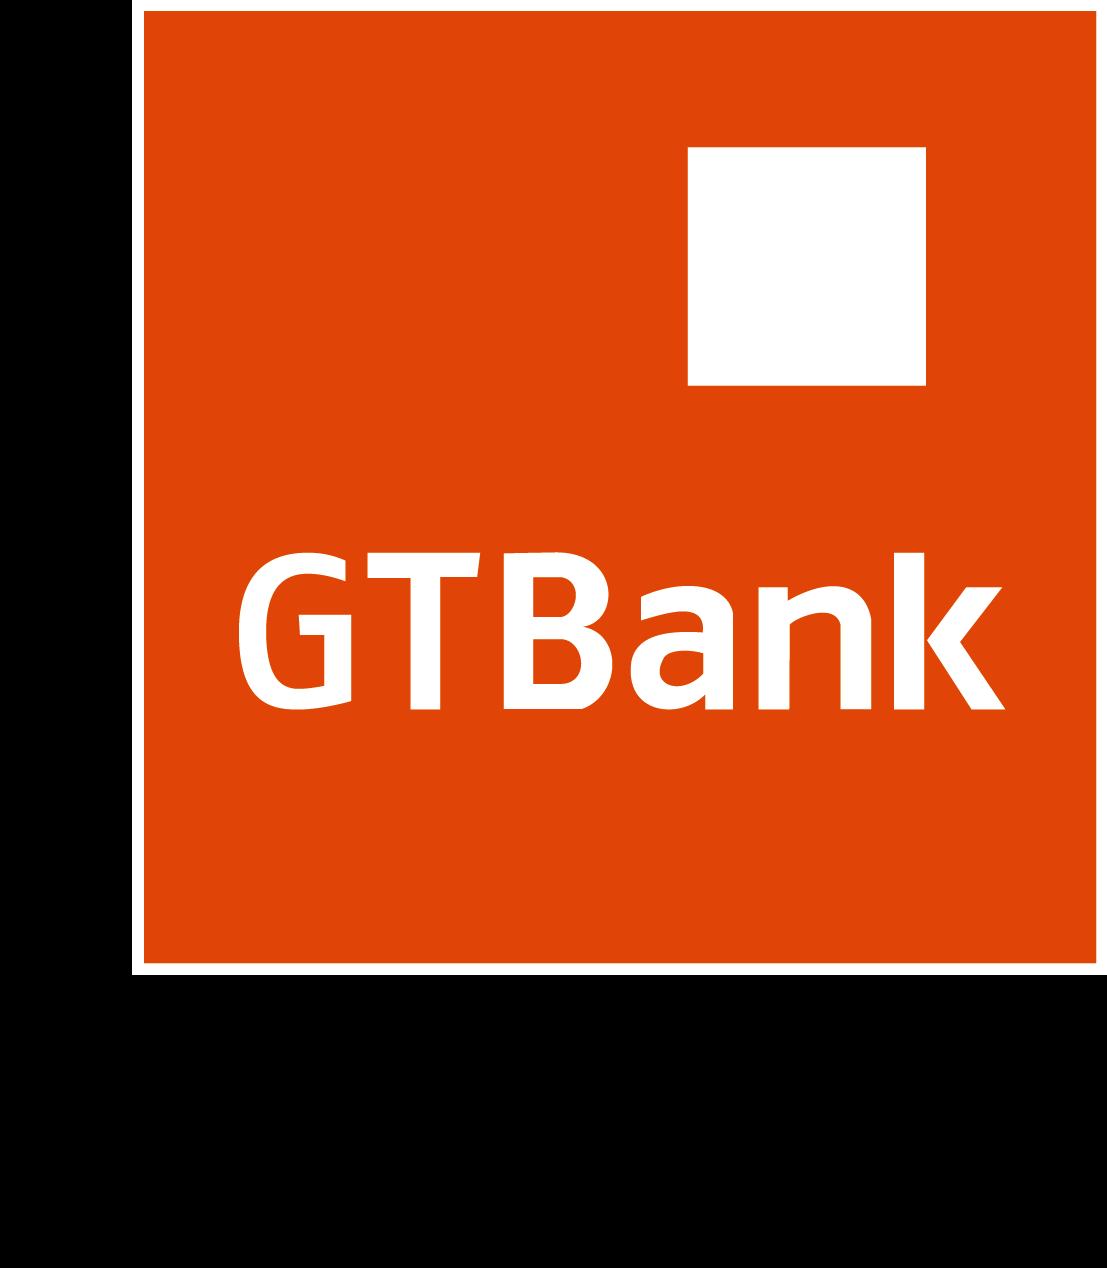 GTbank Logo [Guaranty Trust Bank] png